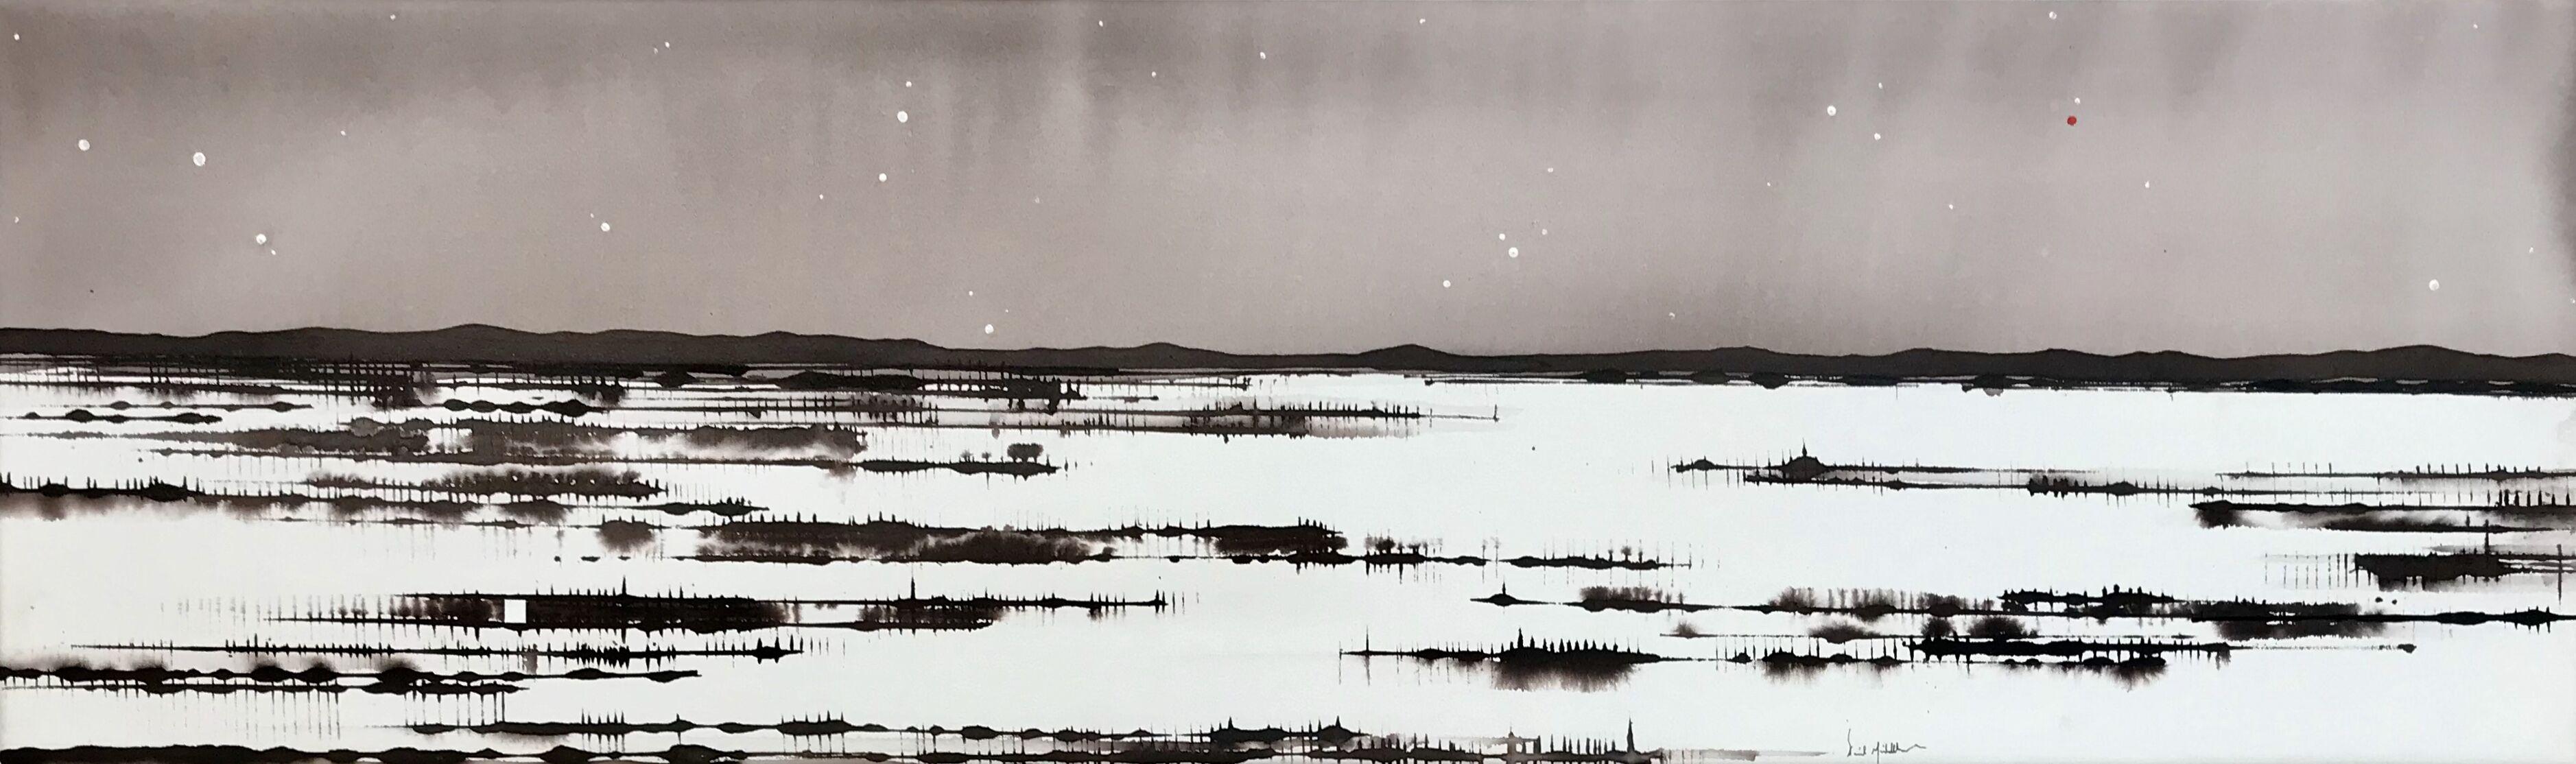 Art Atrium David Middlebrook Moonlight and Desert, Central Australia